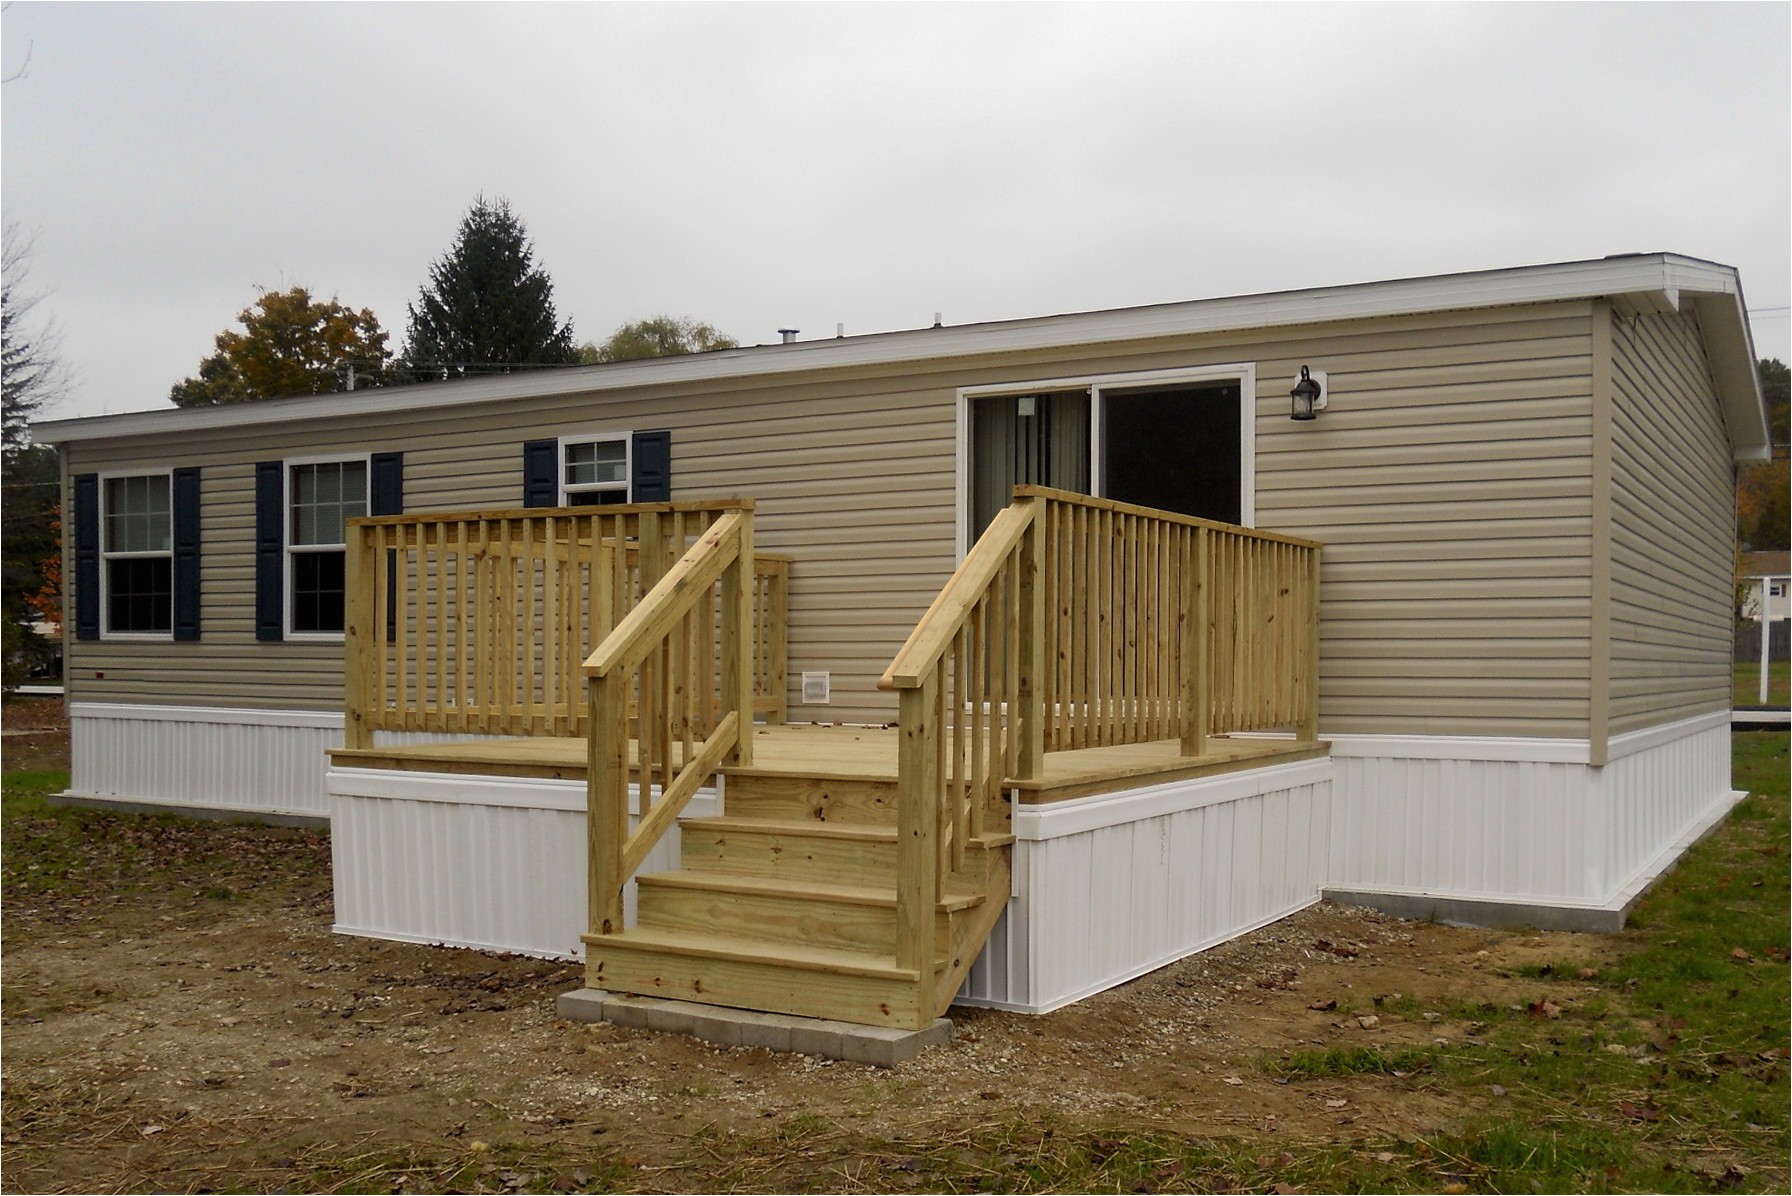 Deck Plans Mobile Homes Back Decks for Mobile Homes Home Design Ideas